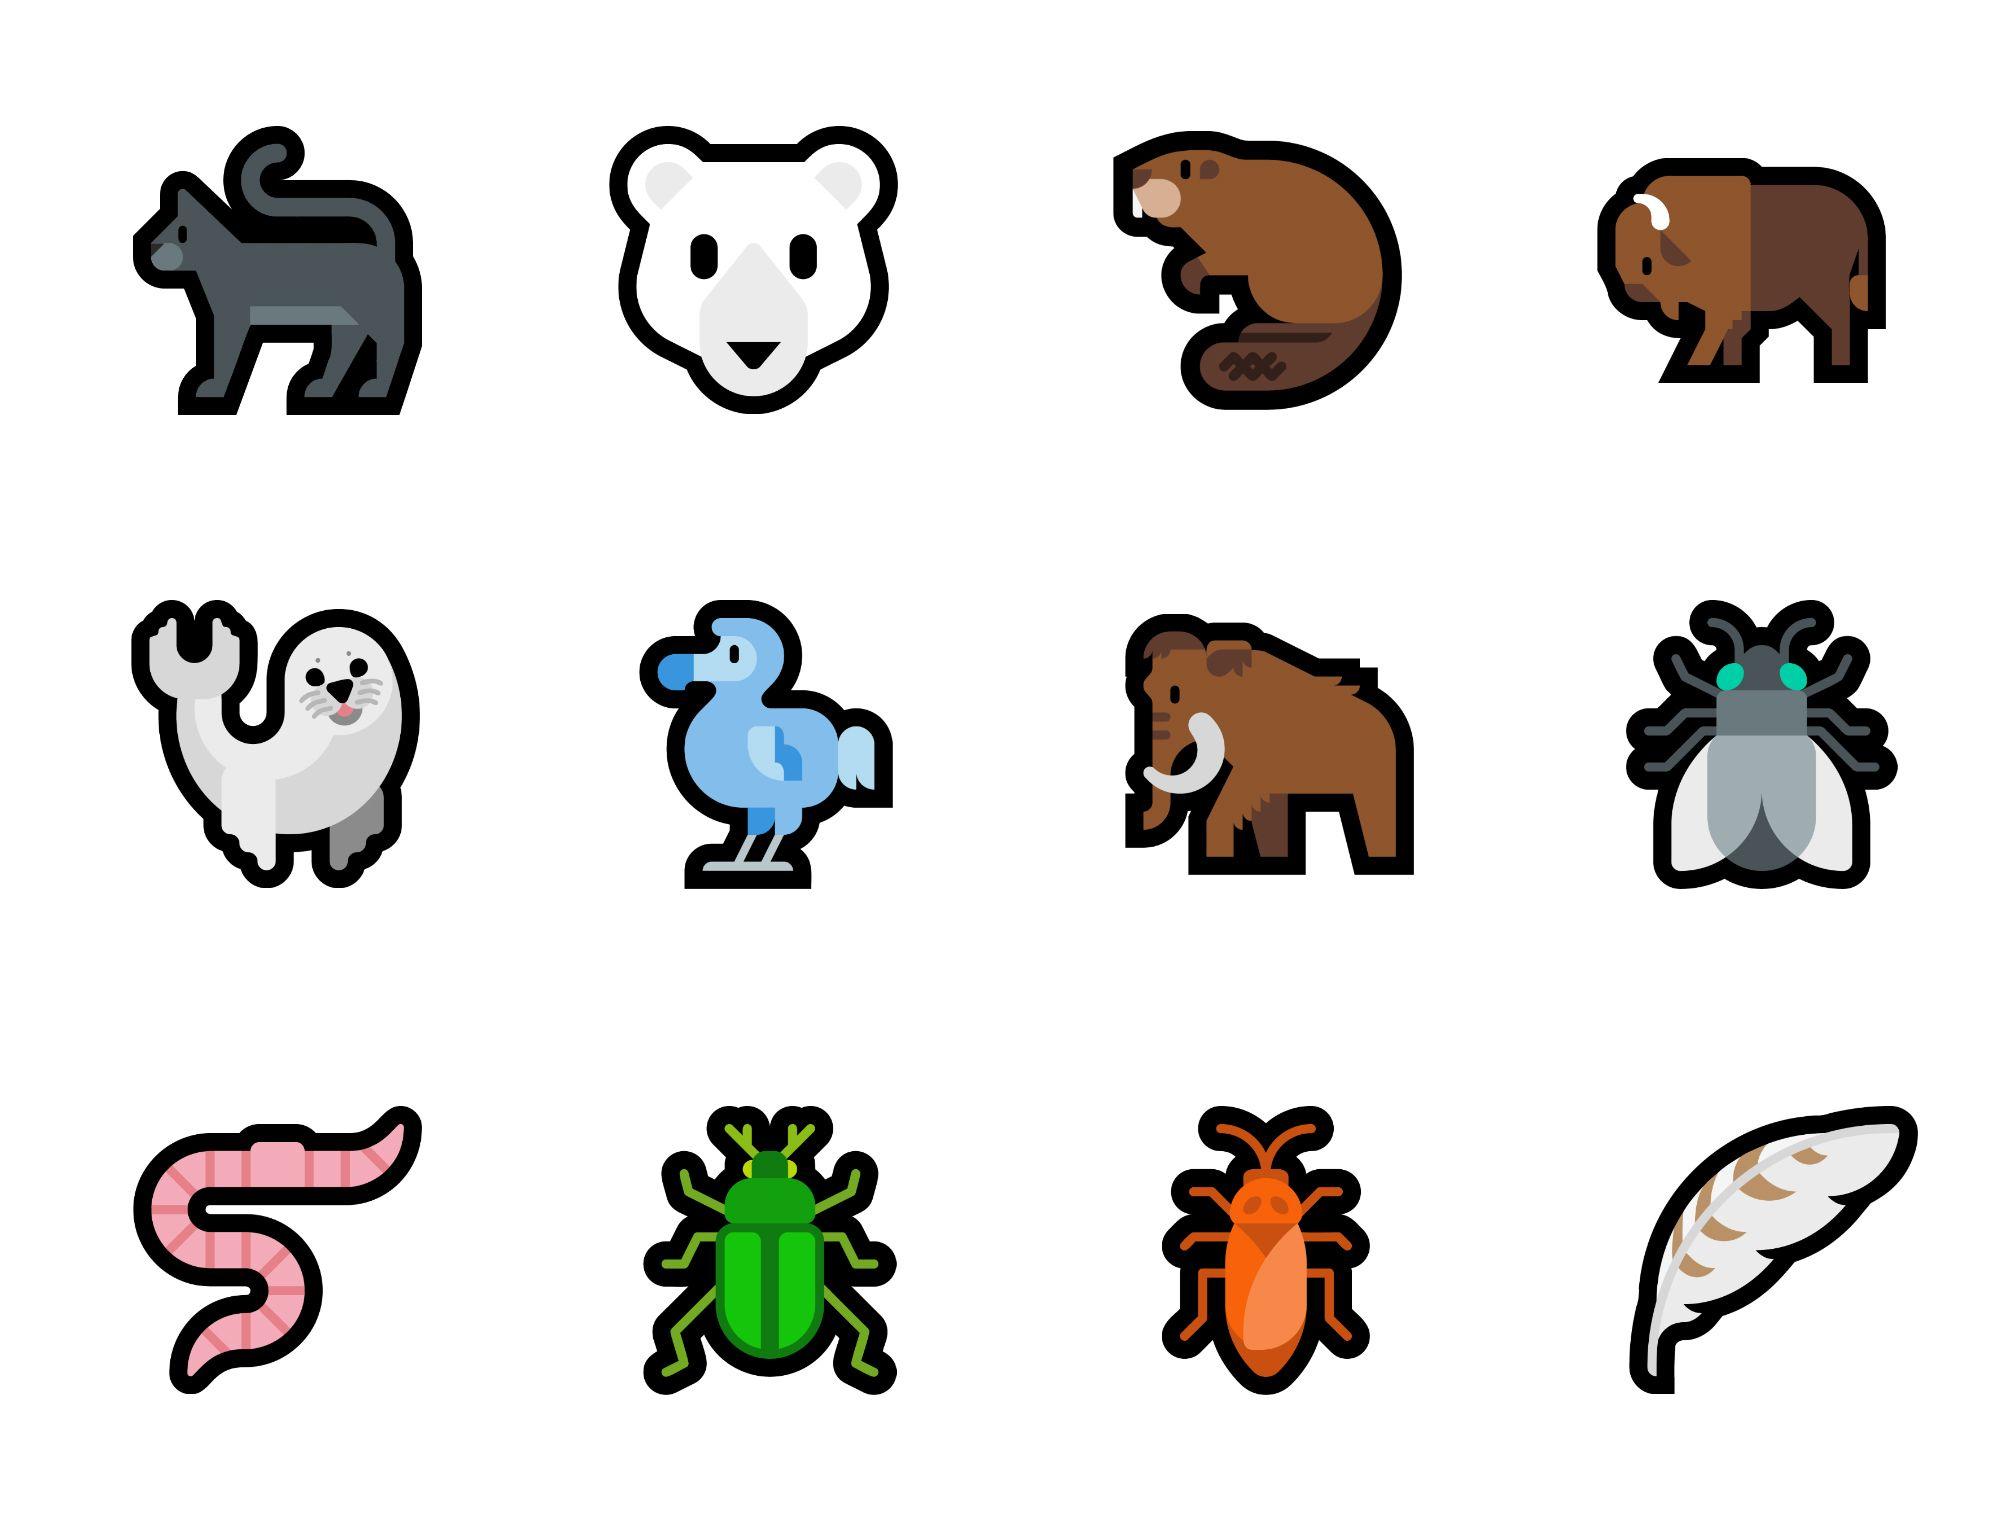 Emojipedia-Windows-11-New-Animal-Emojis